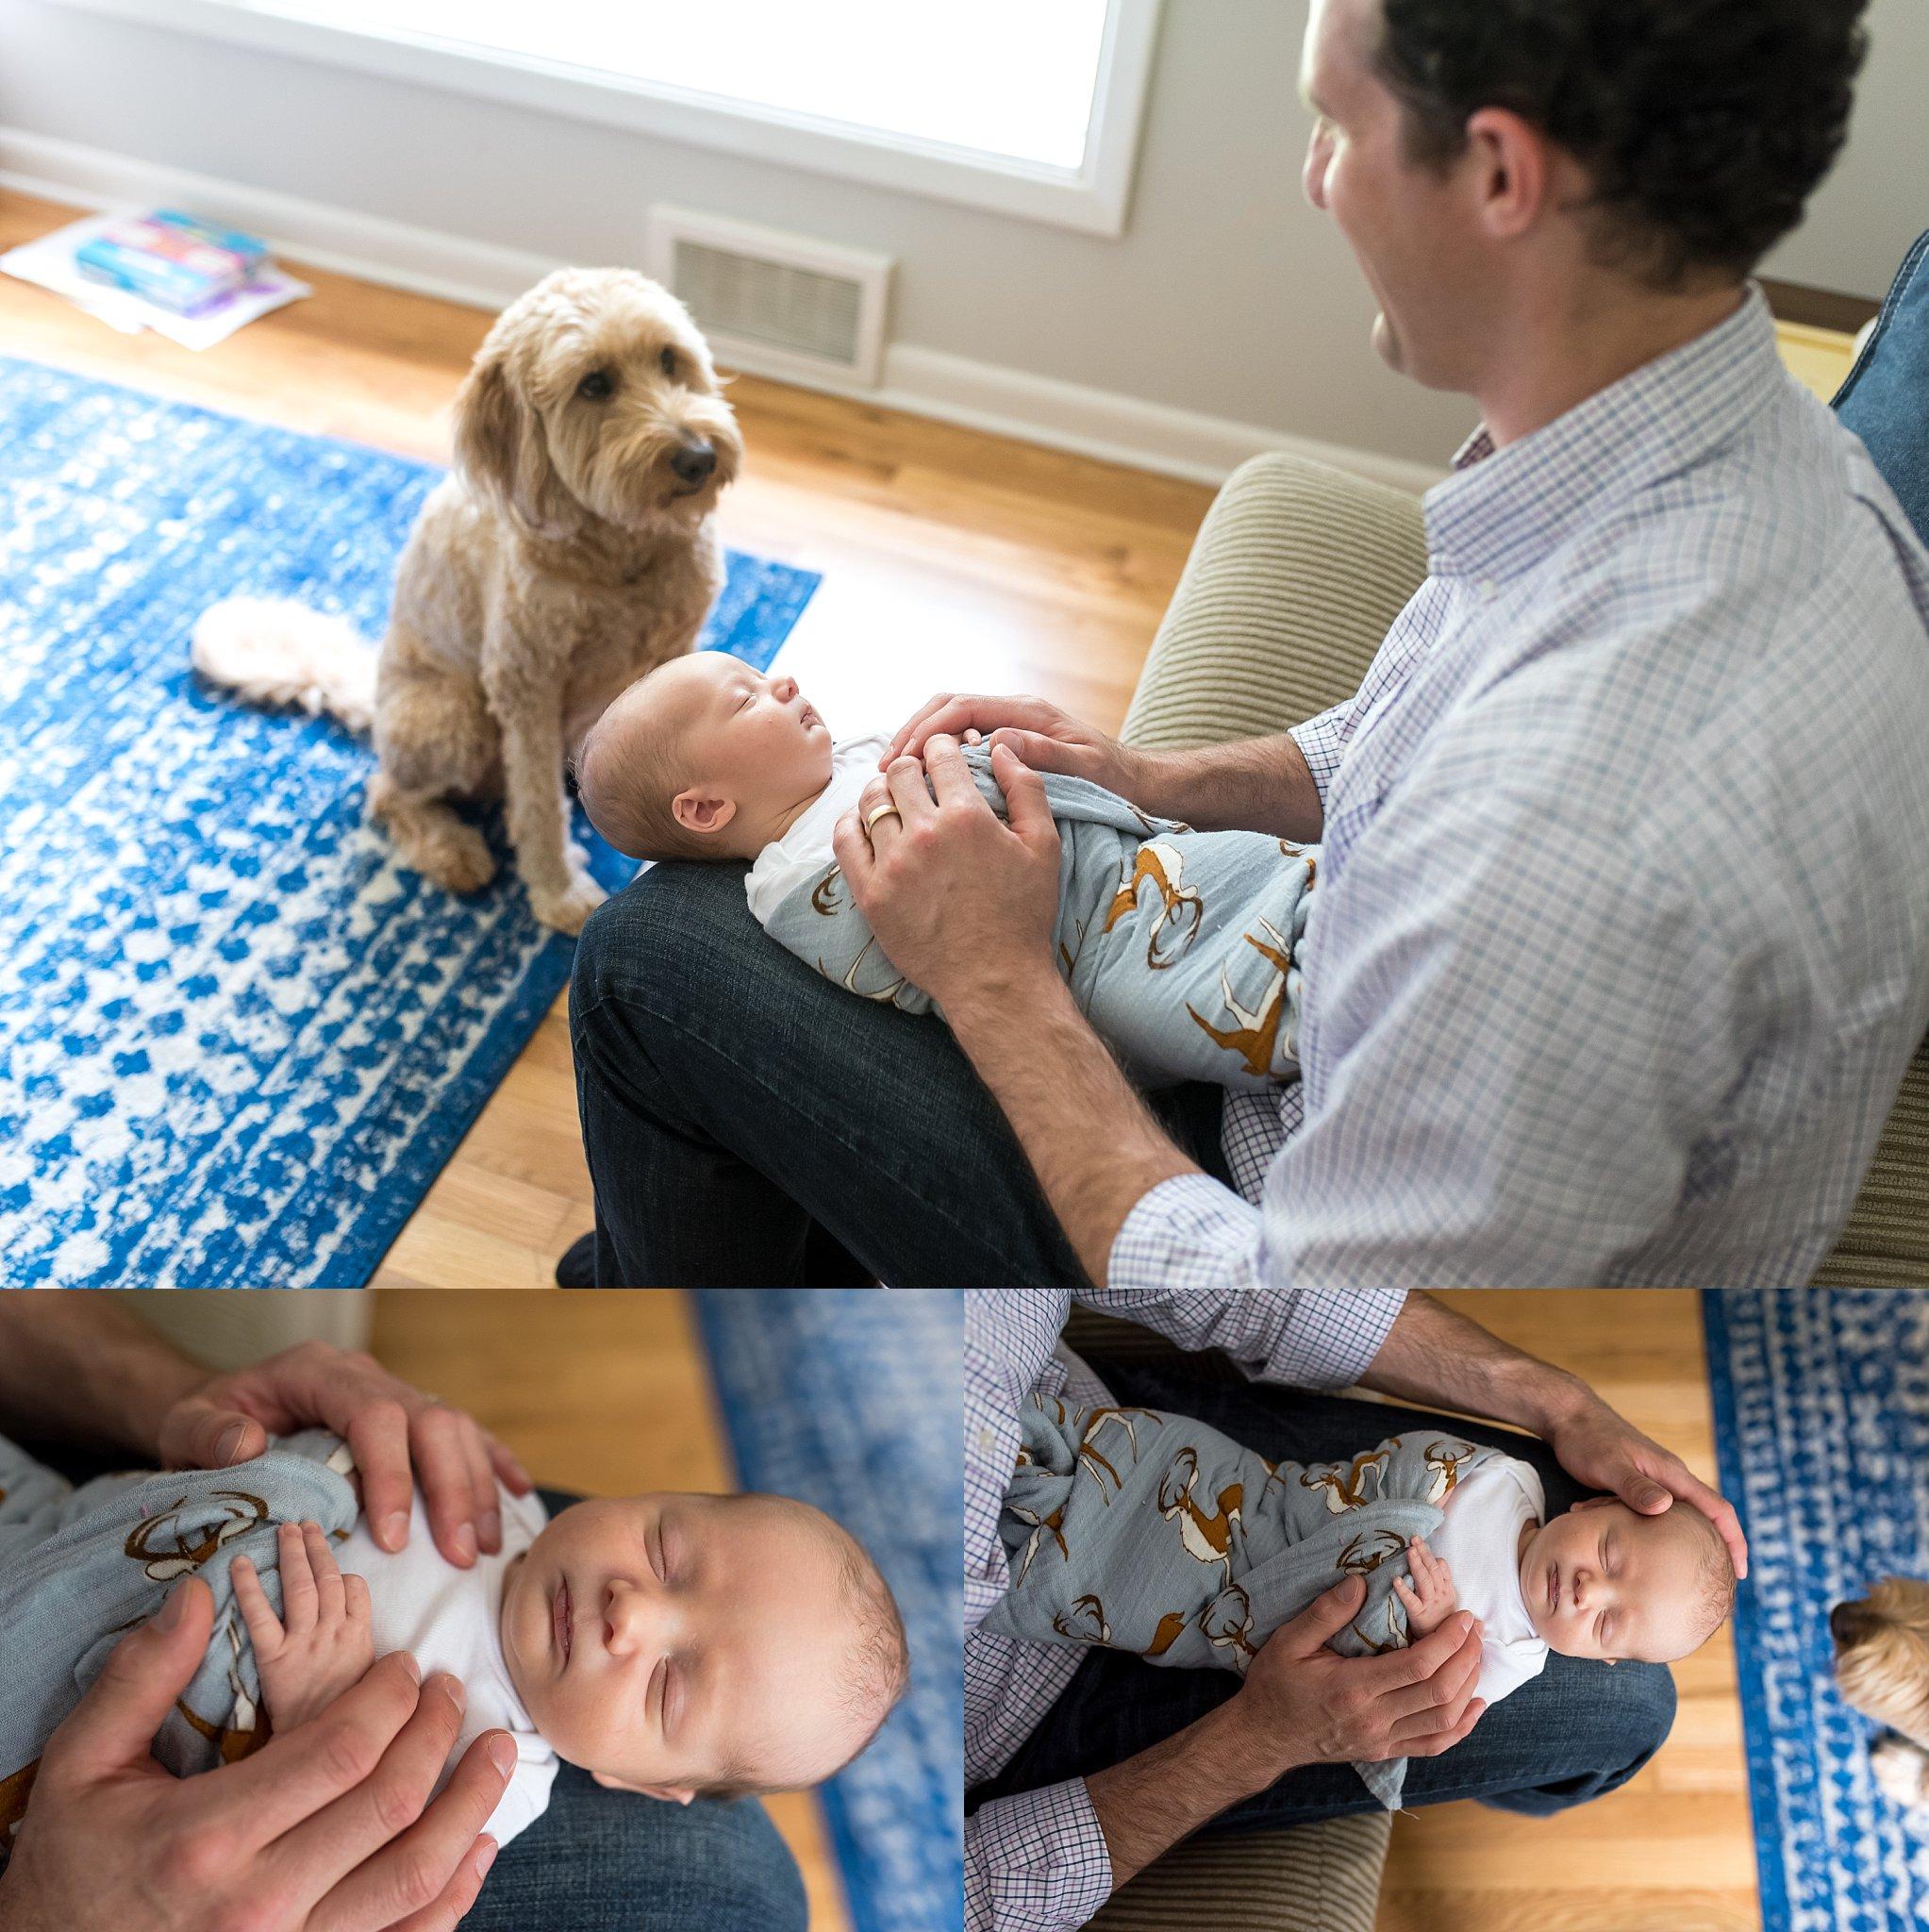 atlanta-family-photographers-decatur-newborn-photography (9).jpg